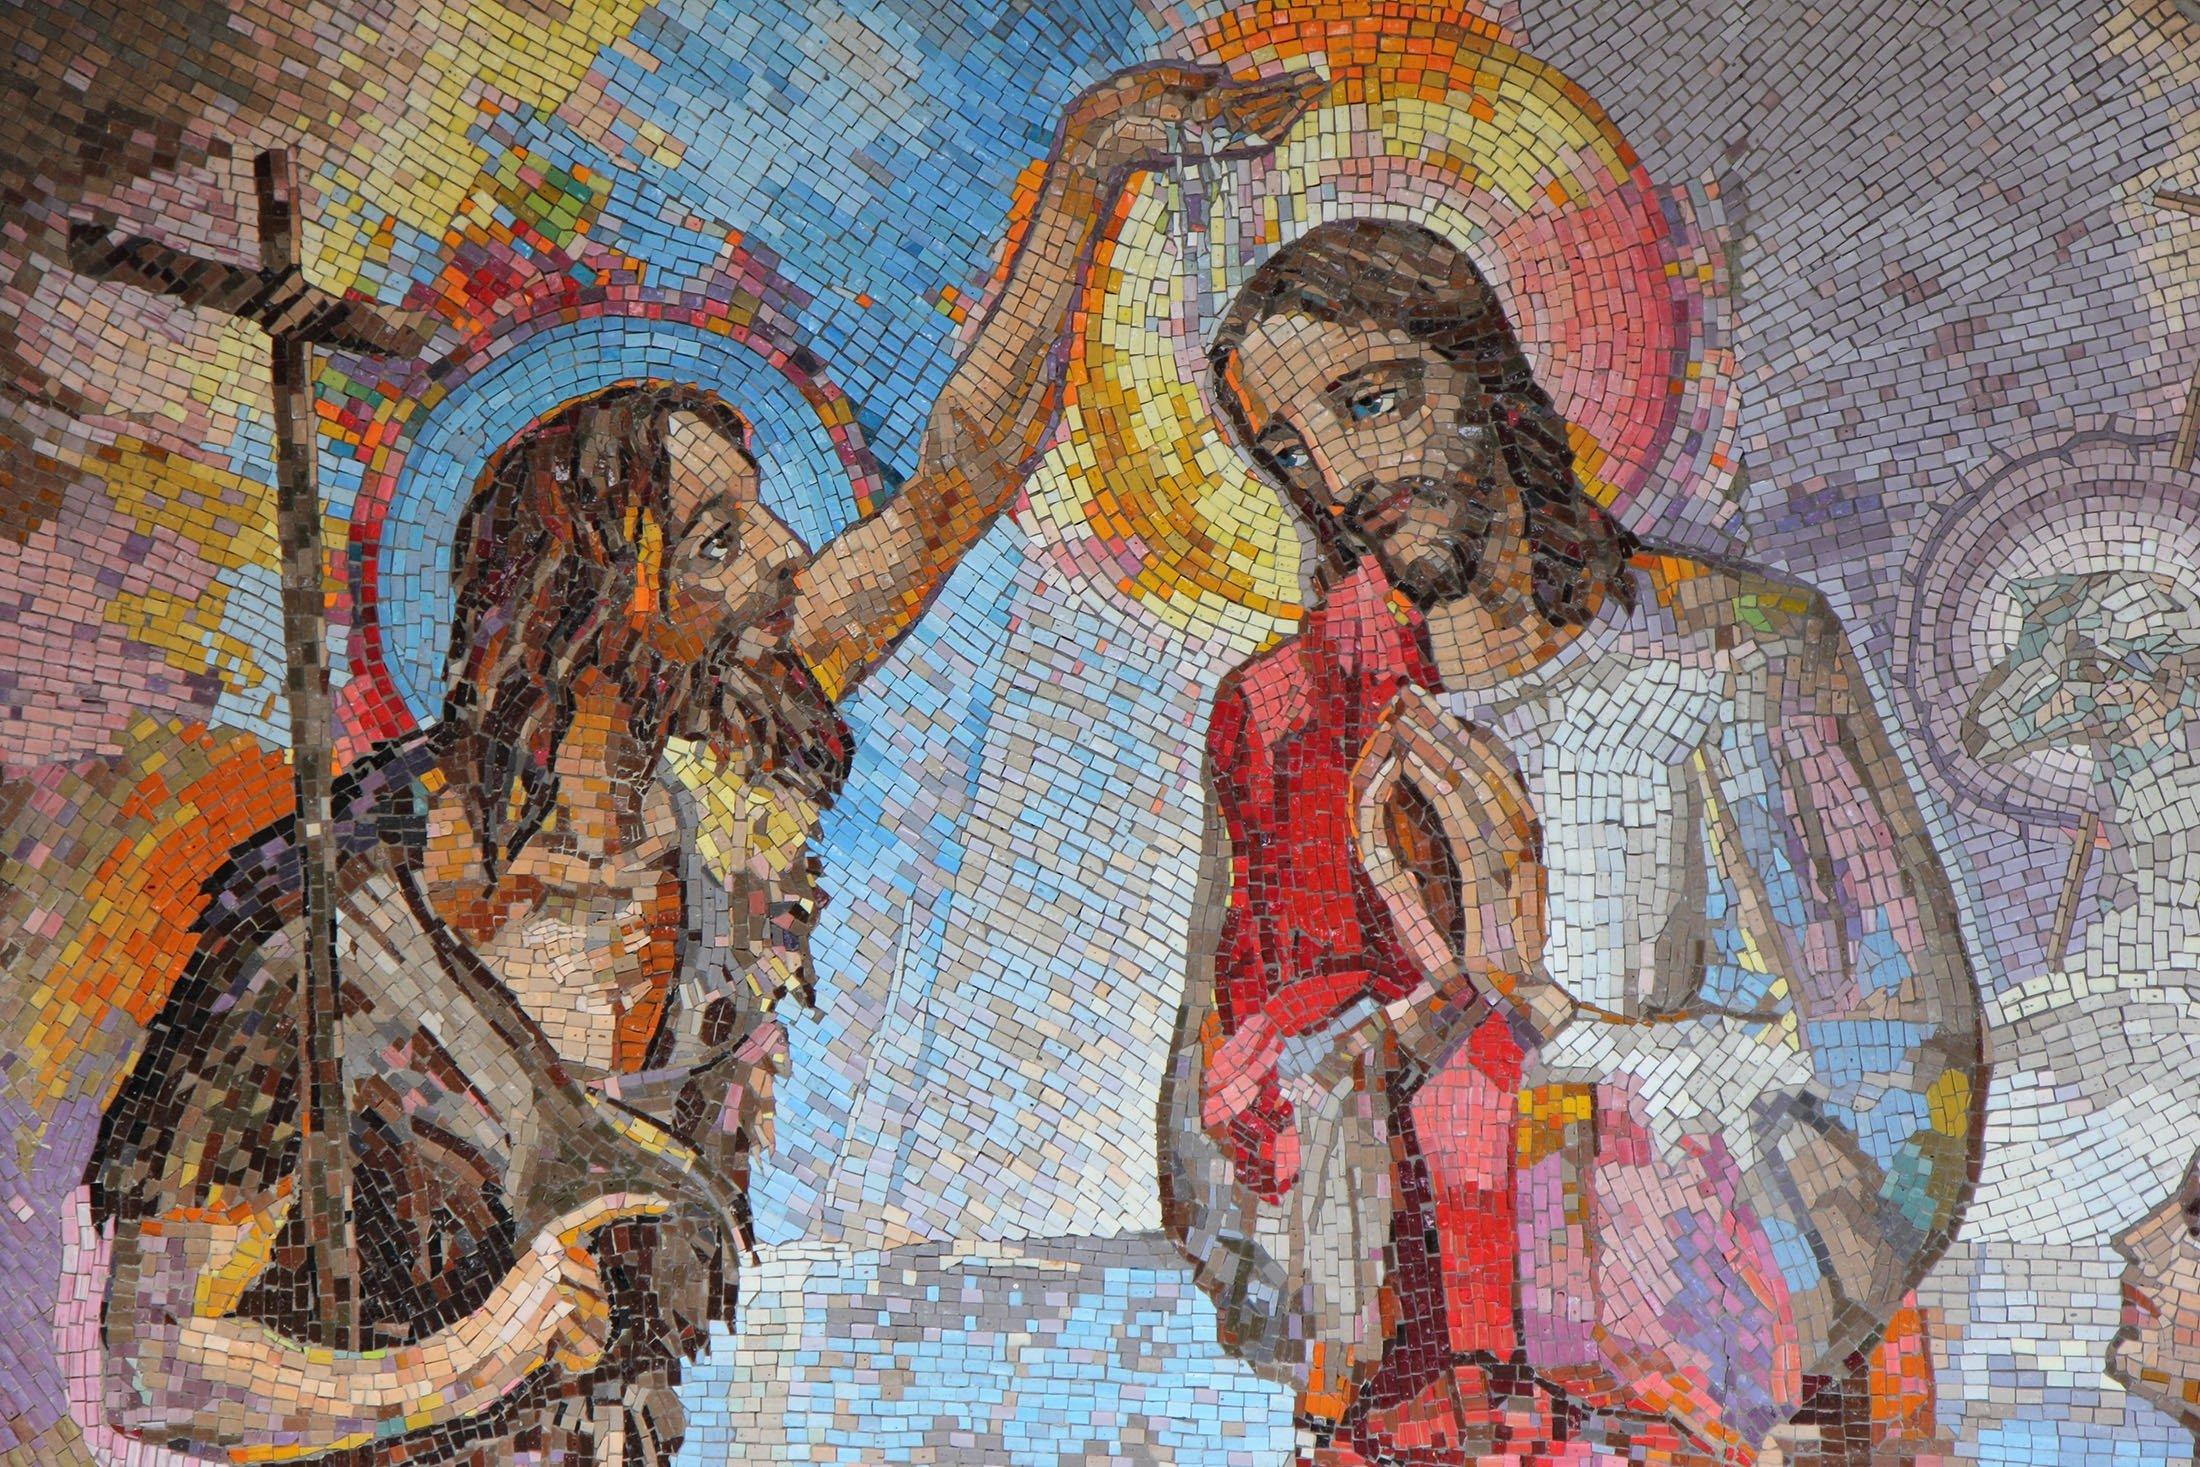 A historical mosaic depicts thebaptism of the Prophet Jesus by Saint John the Baptist, Medjugorje, Bosnia-Herzegovina, June 5, 2016. (Shutterstock Photo)